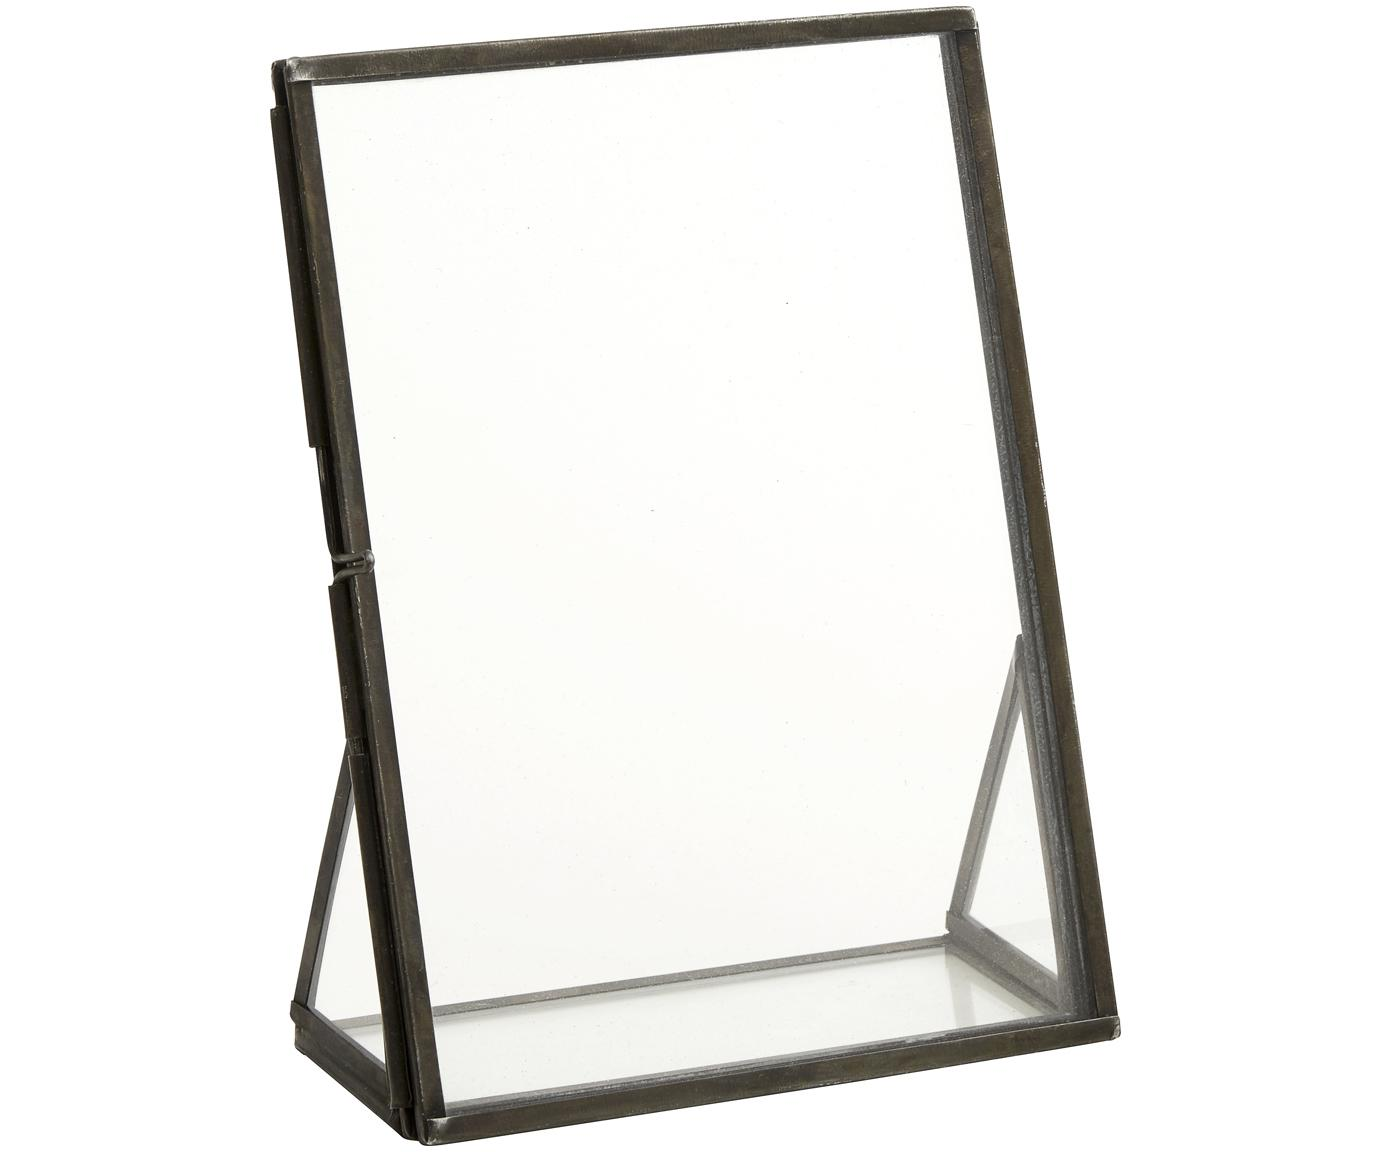 Bilderrahmen Mamun, Rahmen: Metall, beschichtet, Front: Glas, Schwarz, Transparent, 13 x 18 cm